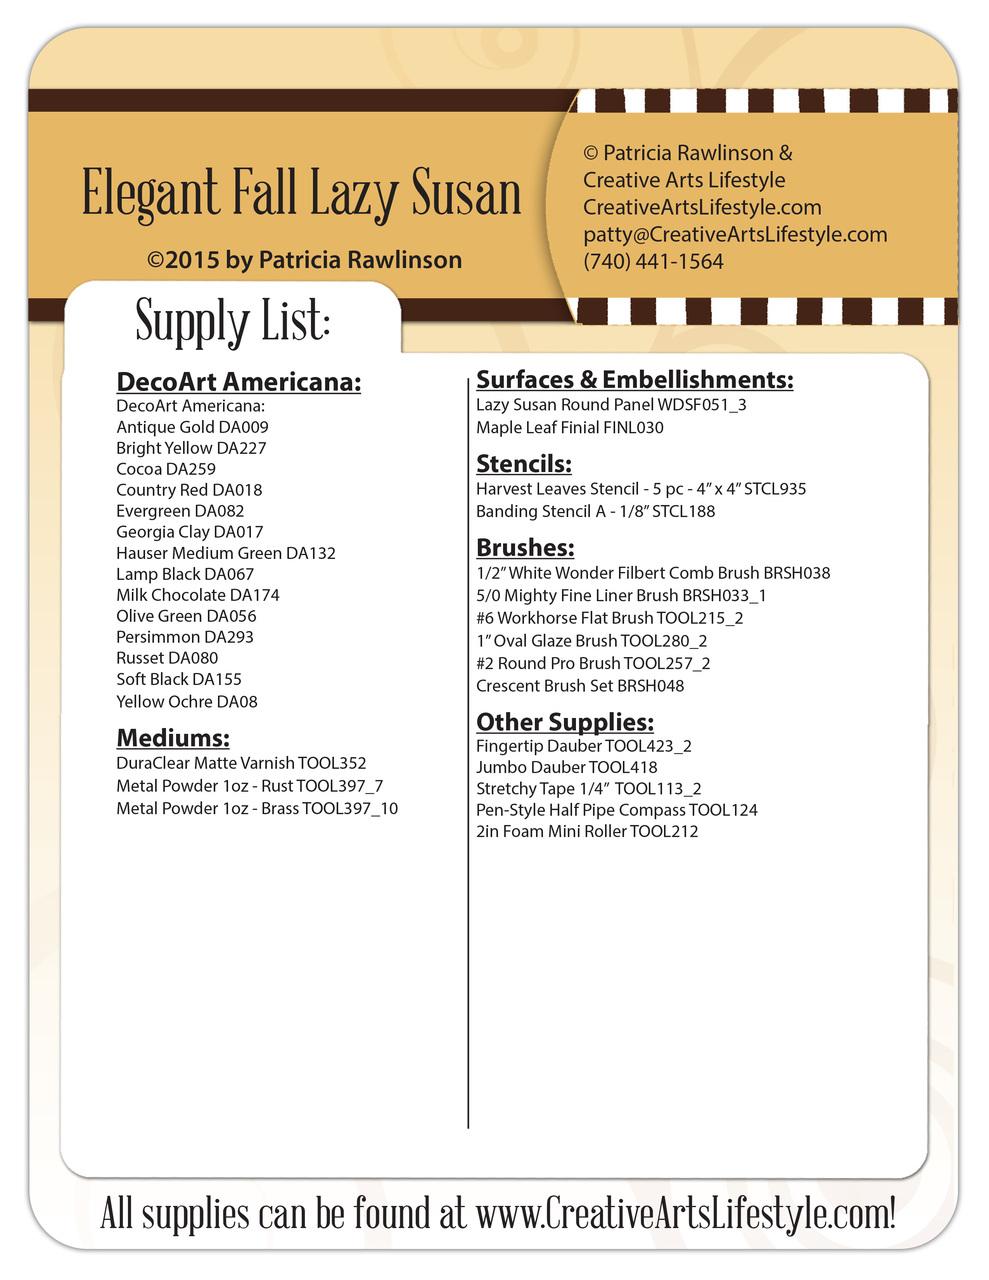 Elegant Fall Lazy Susan Pattern Packet - Patricia Rawlinson